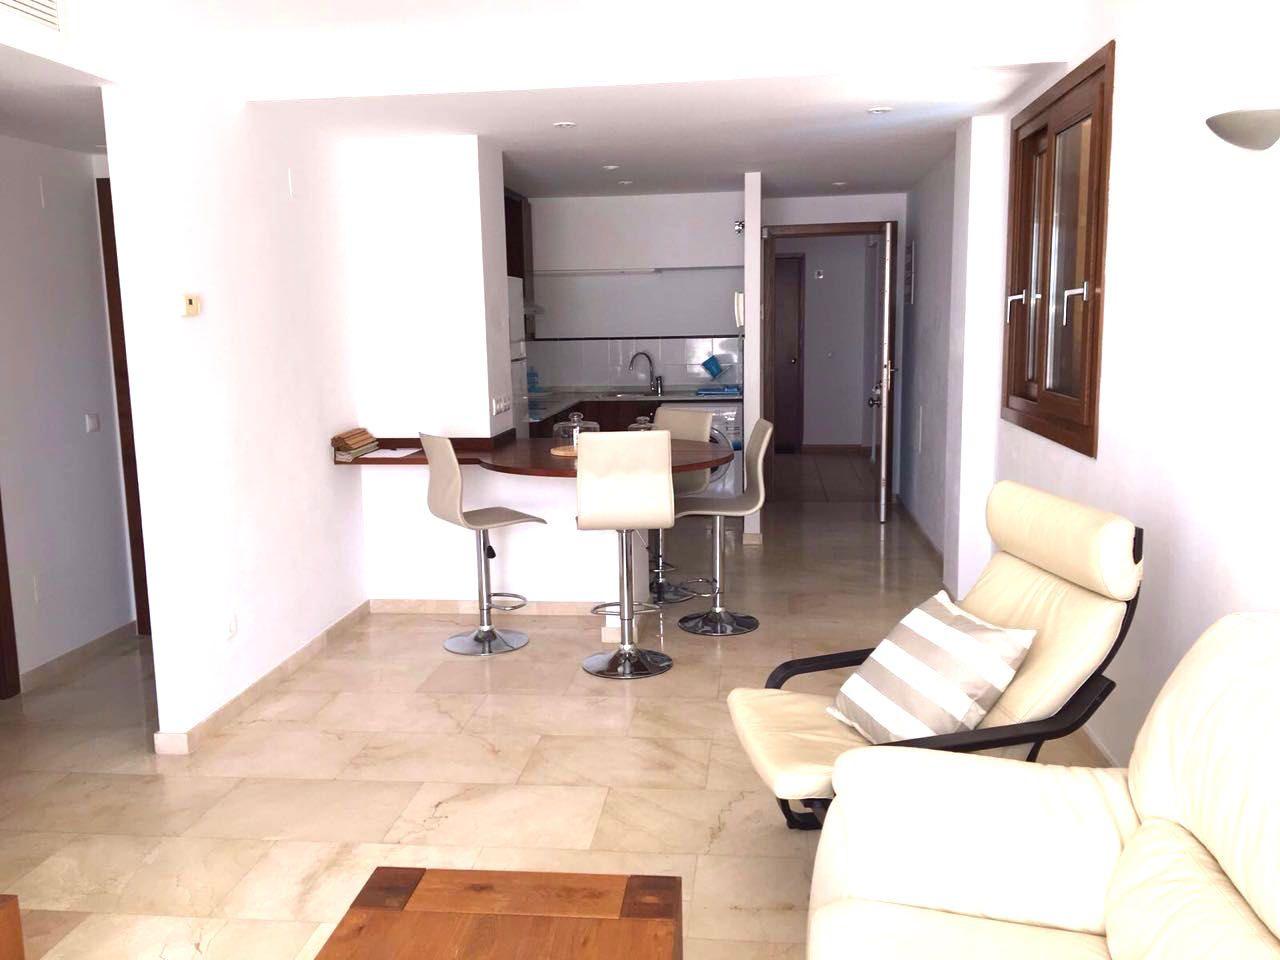 Апартаменты в Ориуэла Коста, Испания, 70 м2 - фото 3